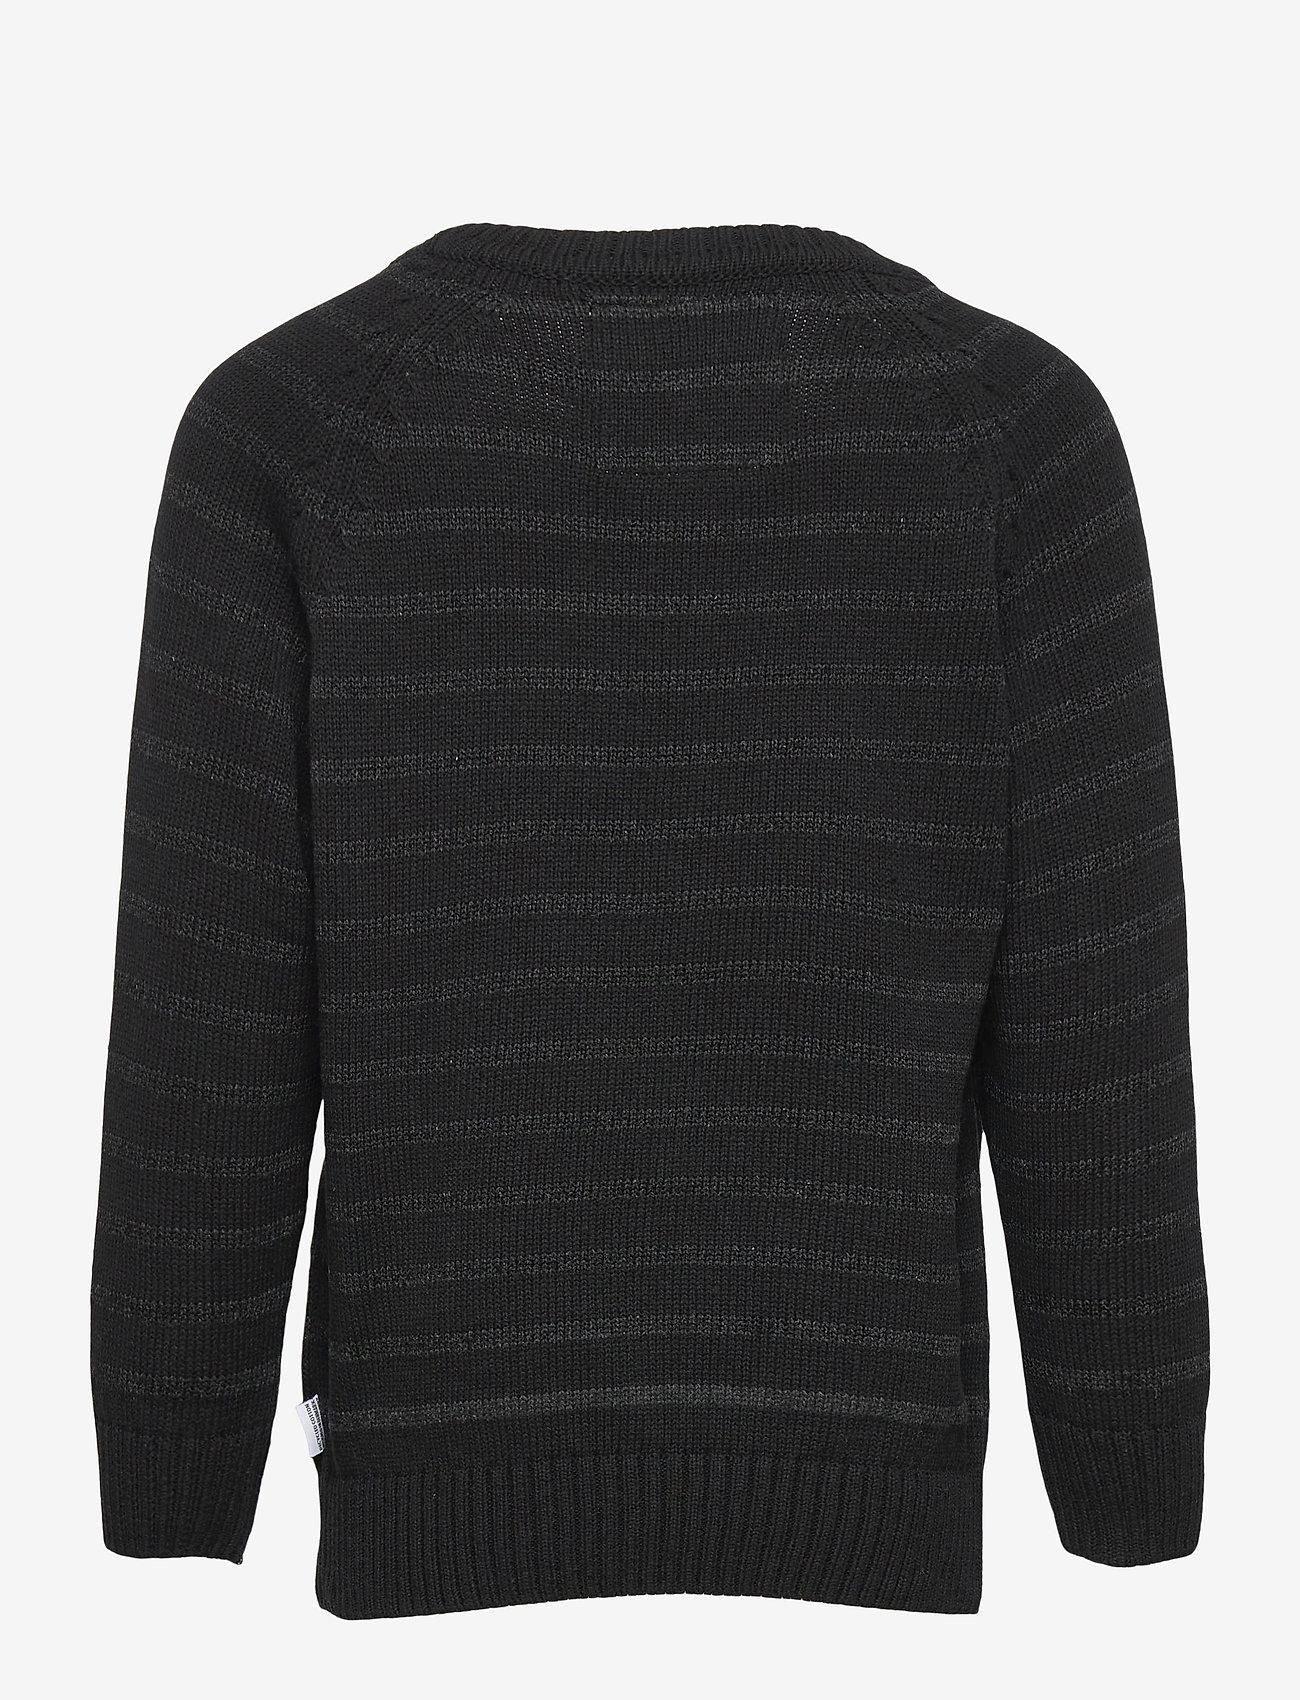 Kronstadt - Liam Crew Stripe Recycle - jumpers - black/charcoal - 1